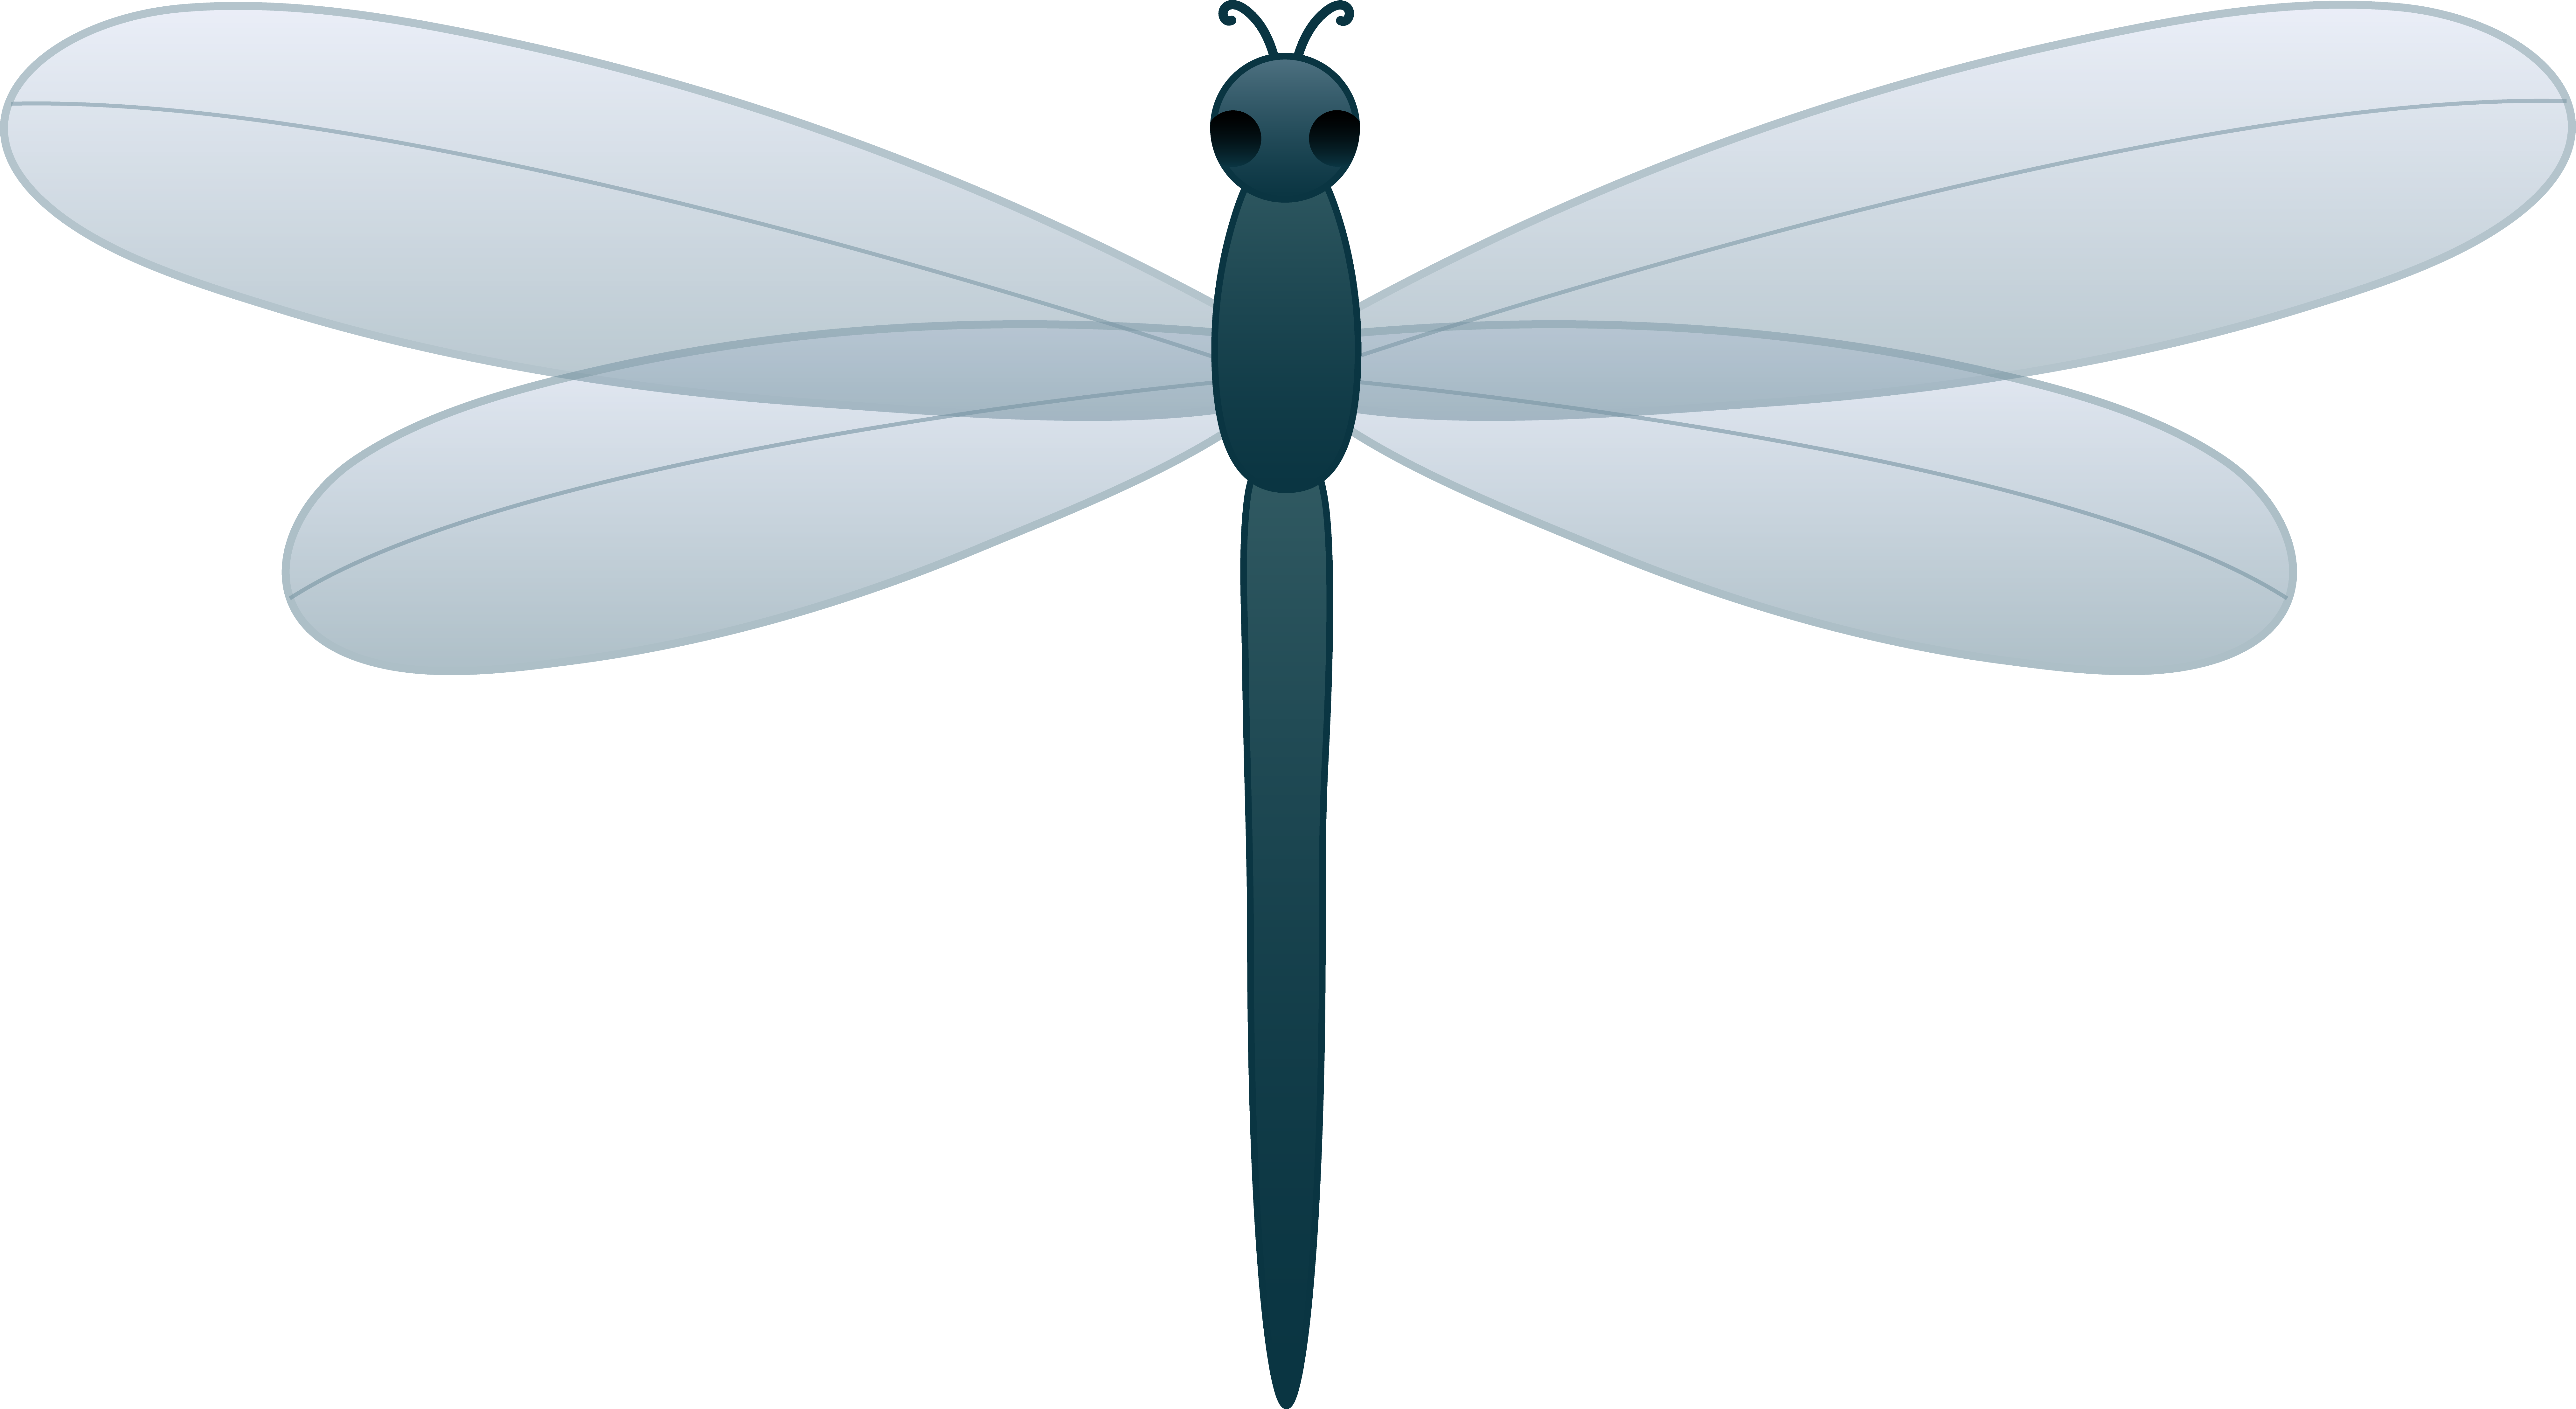 Cartoon Dragonfly Clipart - Clipart Kid